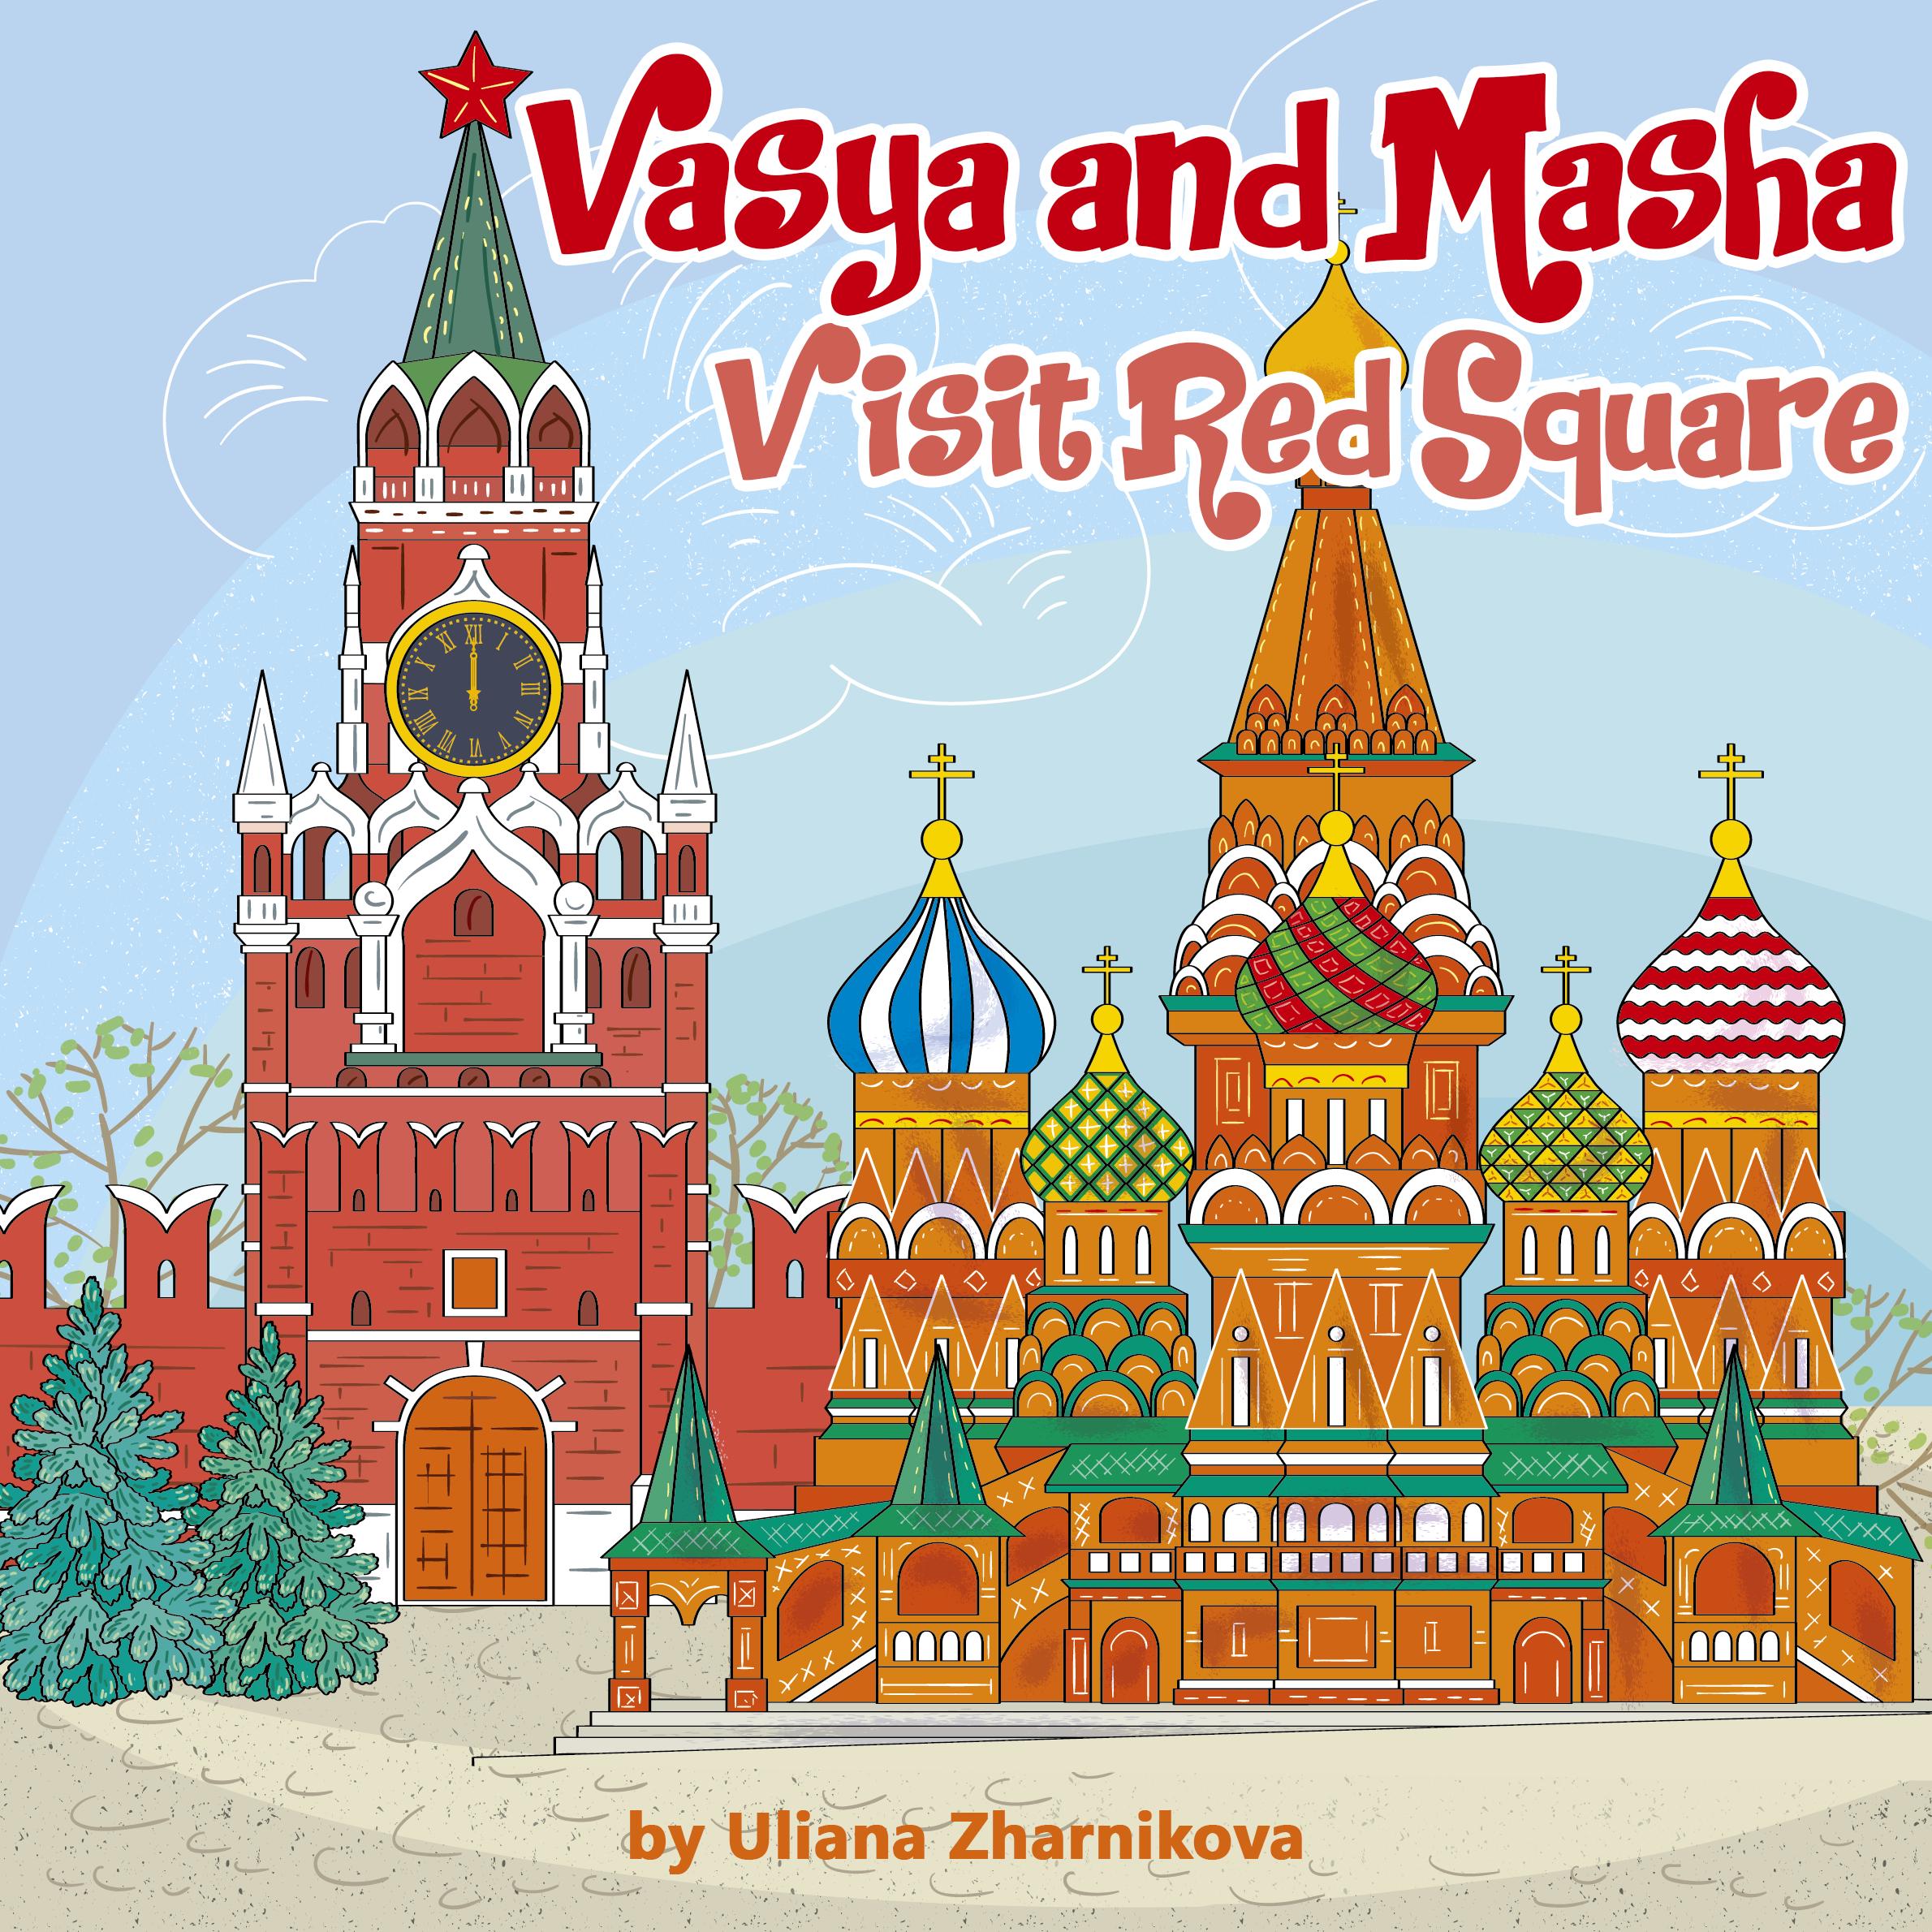 Vasya and Masha Vist Red Square